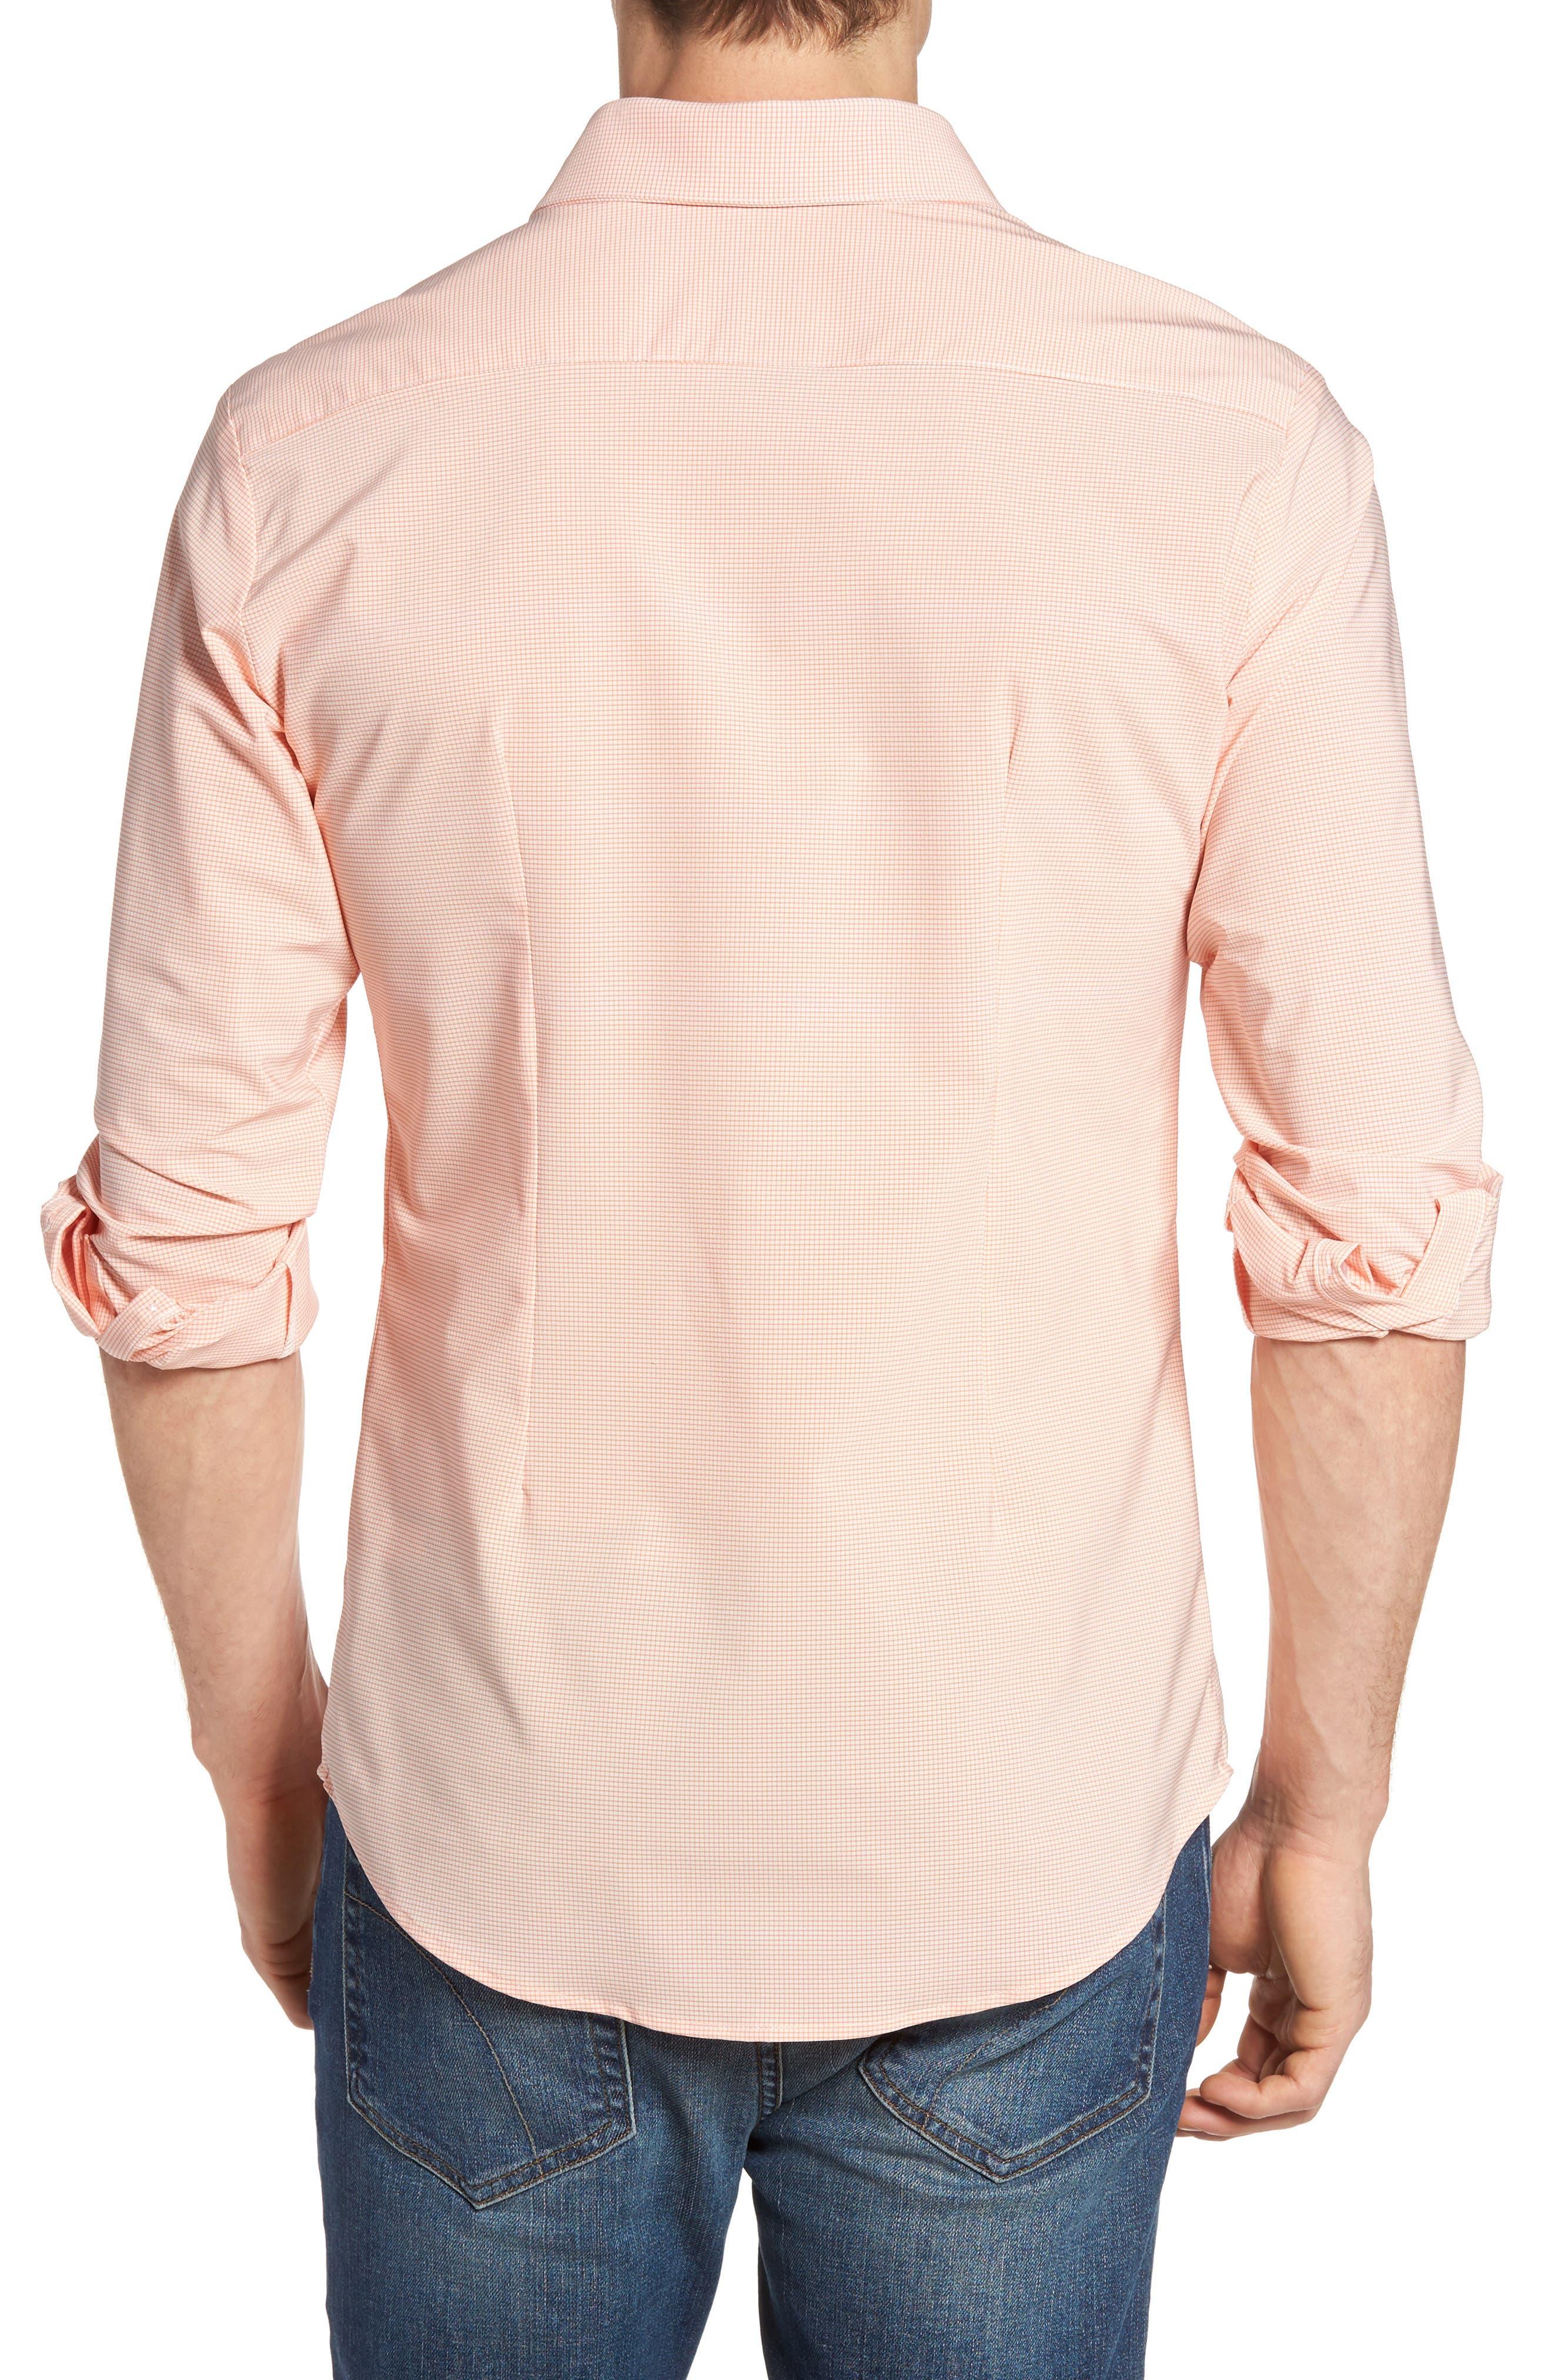 Charles Microcheck Performance Sport Shirt,                             Alternate thumbnail 2, color,                             Peach